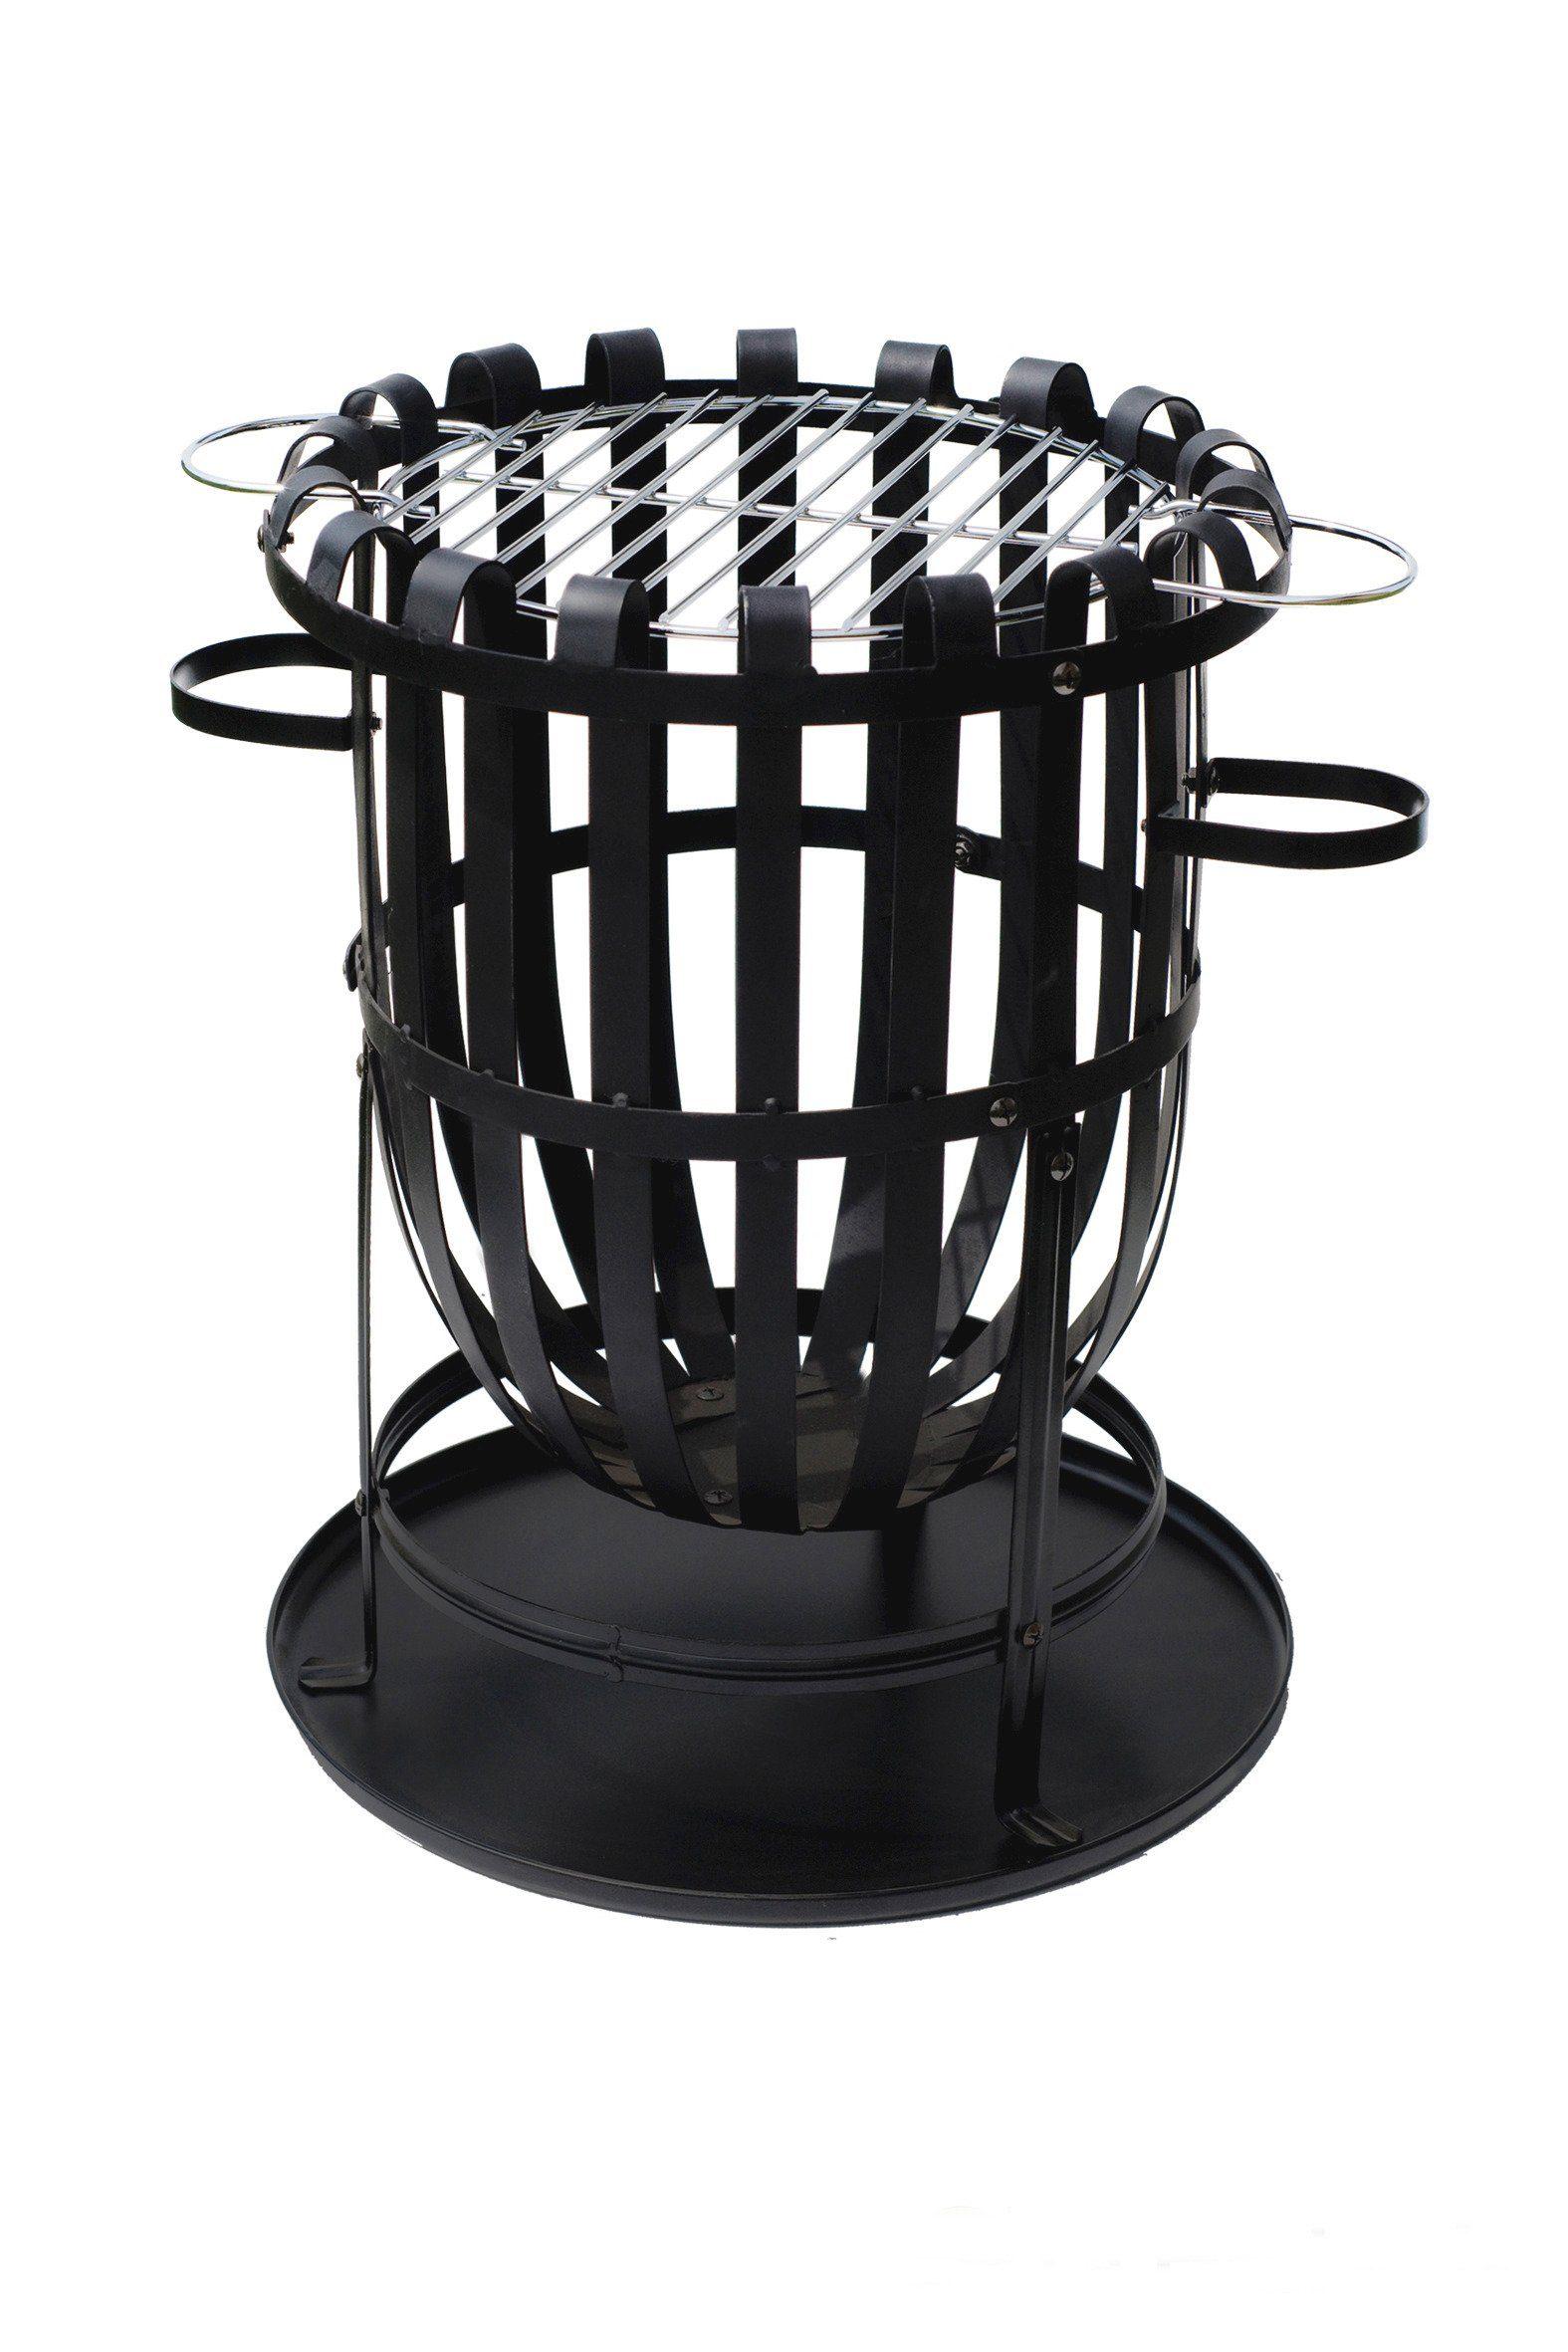 Feuerkorb »Barcelona«, Ø/H: 40/46 cm